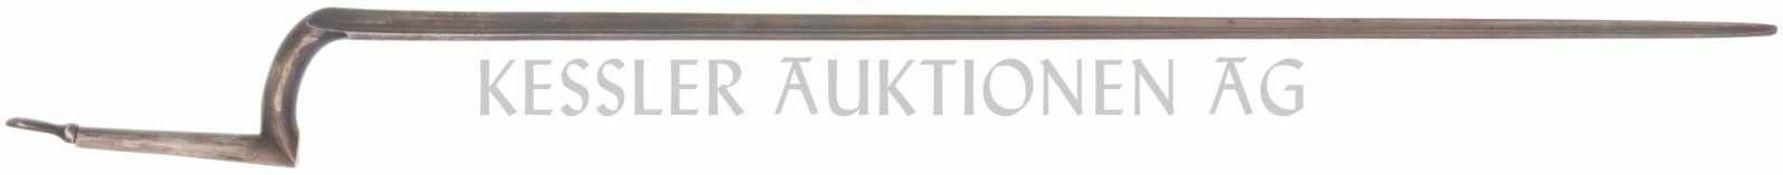 Stichbajonett zu Feldstutzer 1851 KL 500mm, TL 610mm, dreikantige blaue Klinge, Bajonettende mit